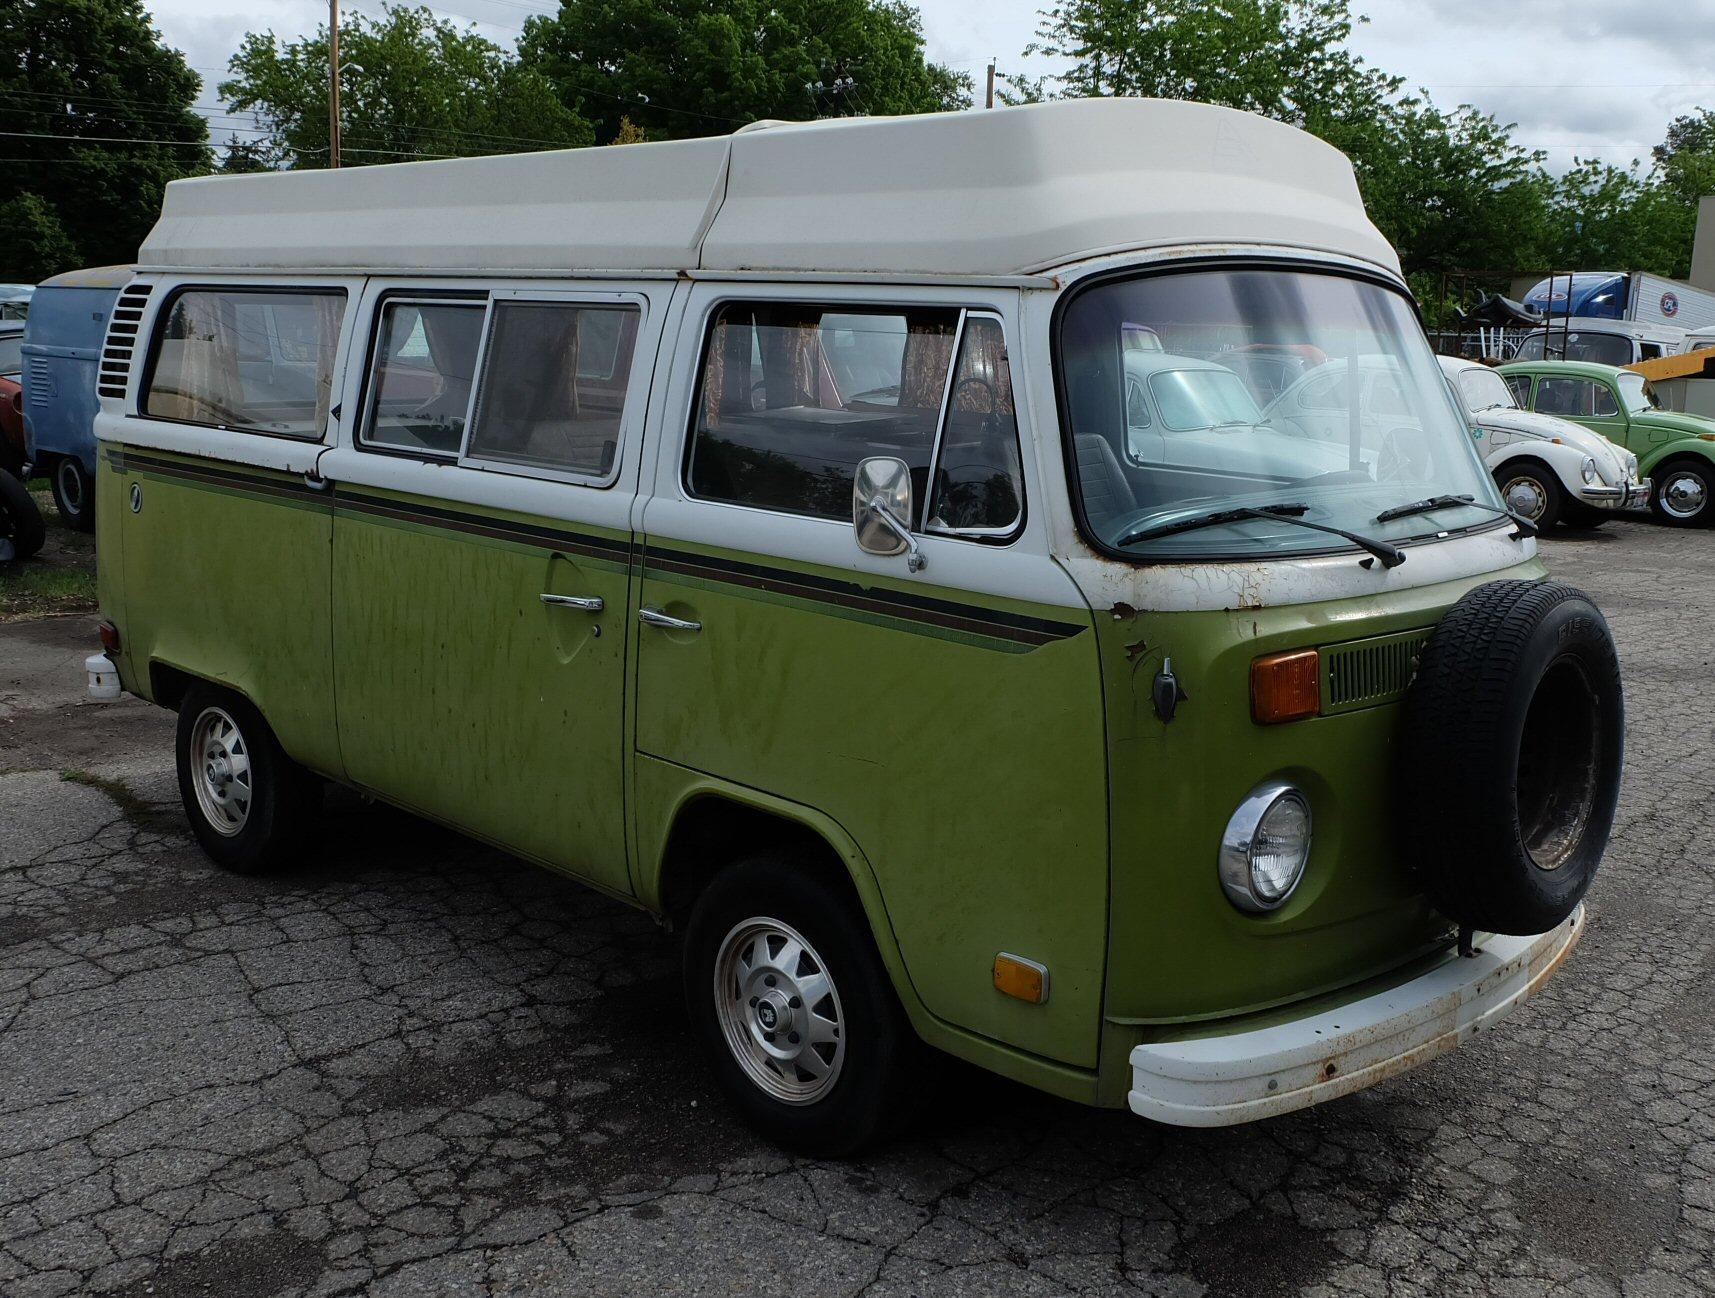 Old Bulli Berlin - Bulli-Handel - Bulli-Verkauf - VW T2b Riviera